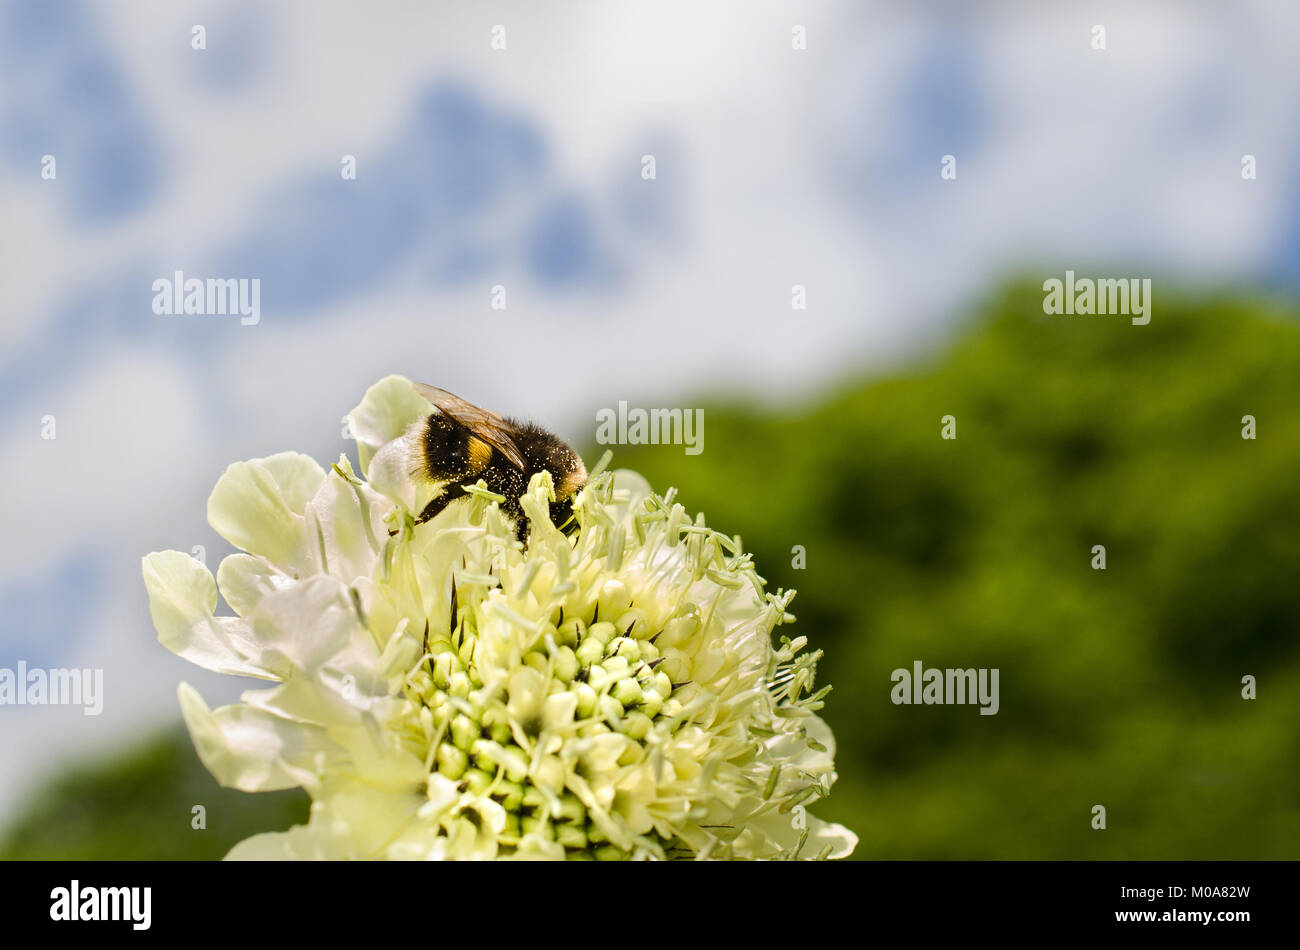 A Giant Bee Stockfotos & A Giant Bee Bilder - Alamy